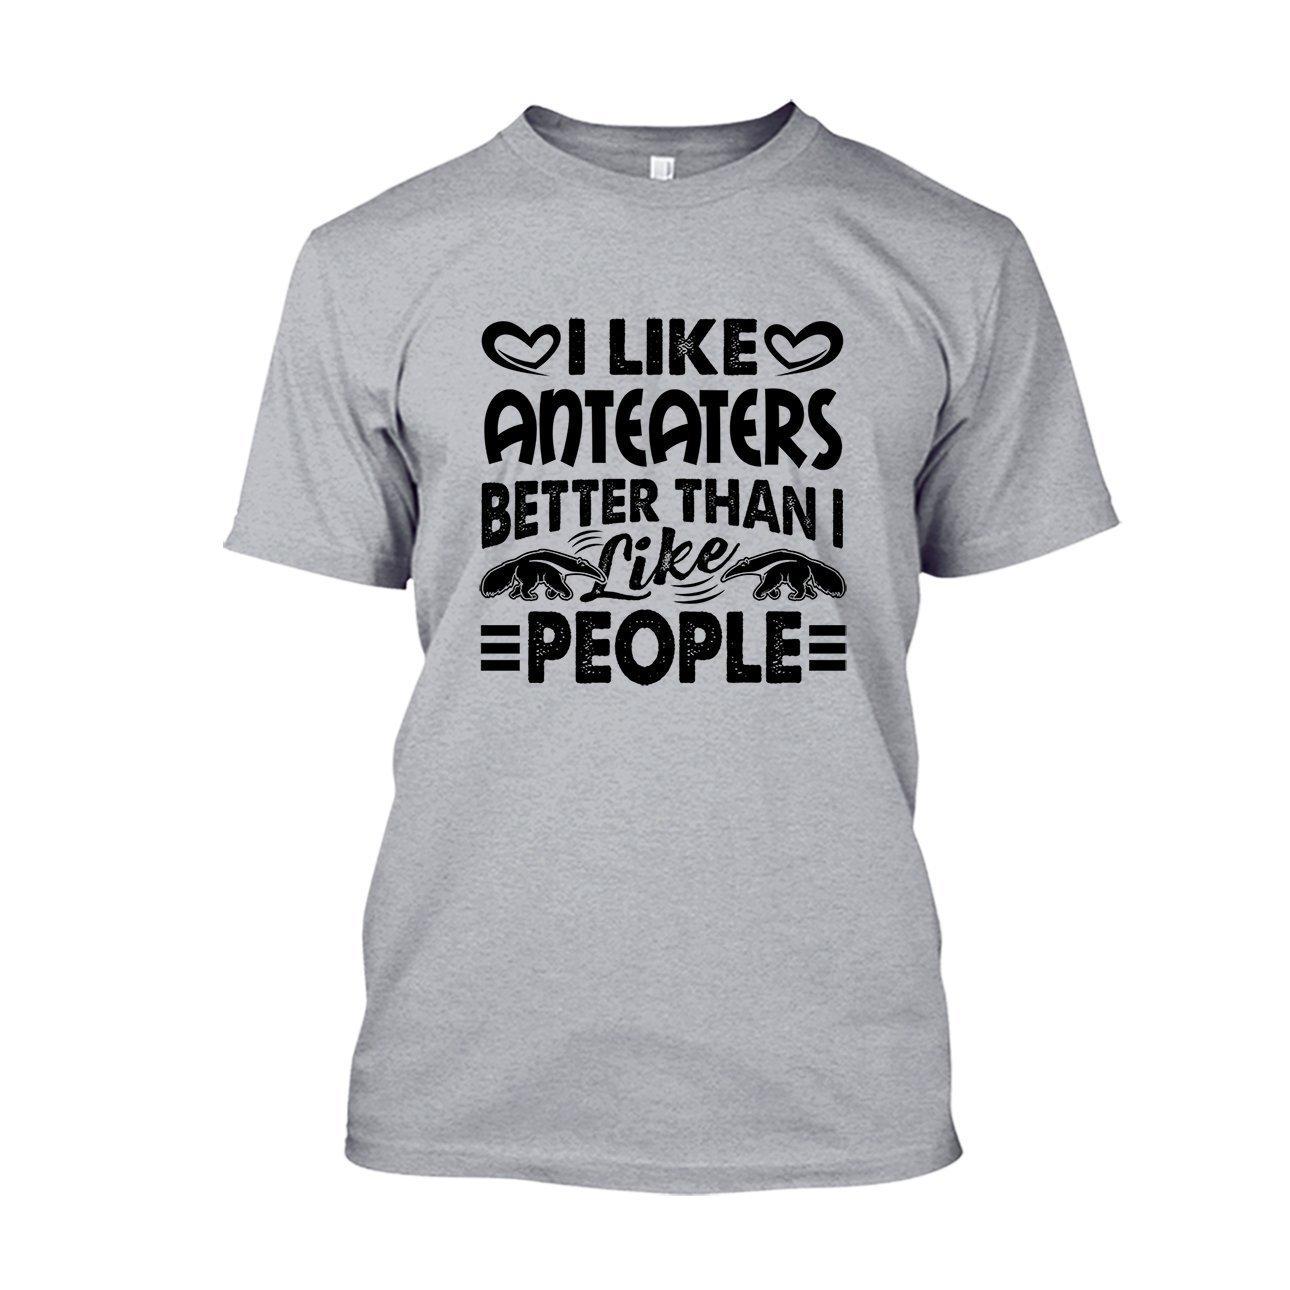 Are Blue Cool I Like Anteaters Tshirt Sweatshirt Design